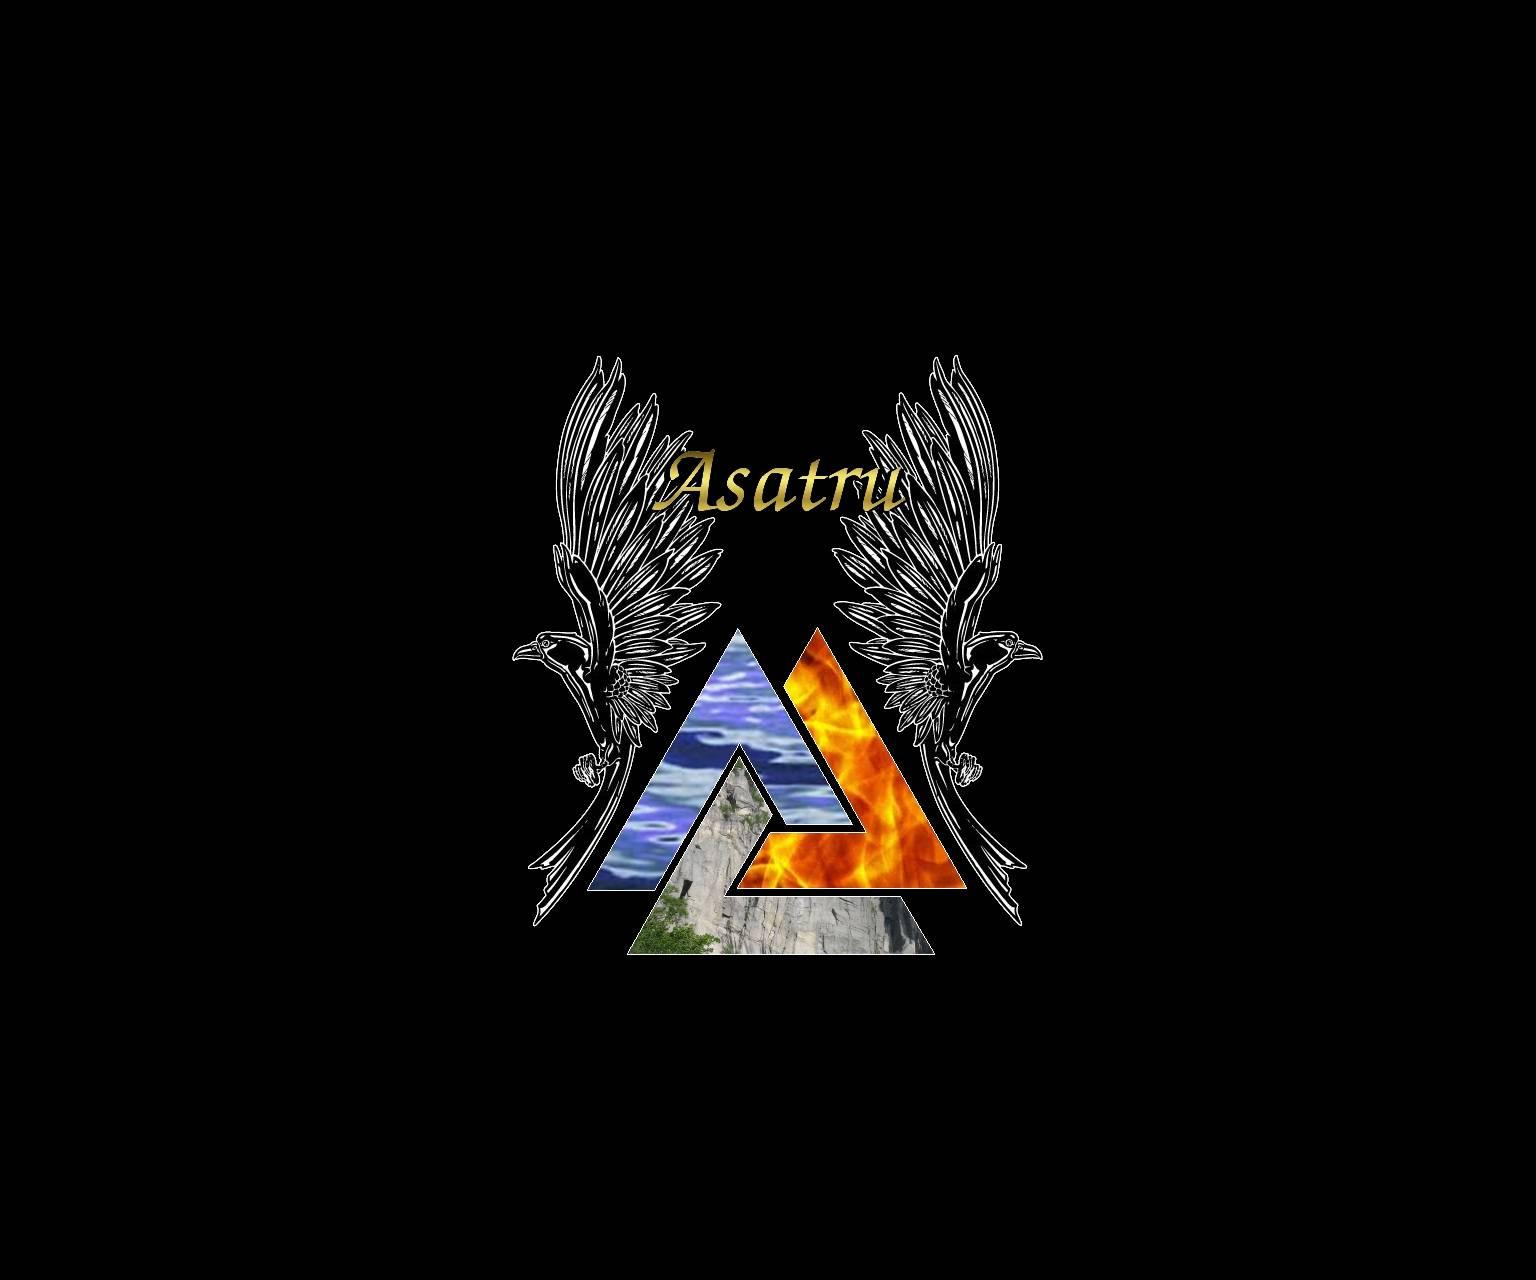 Asatru Ravens